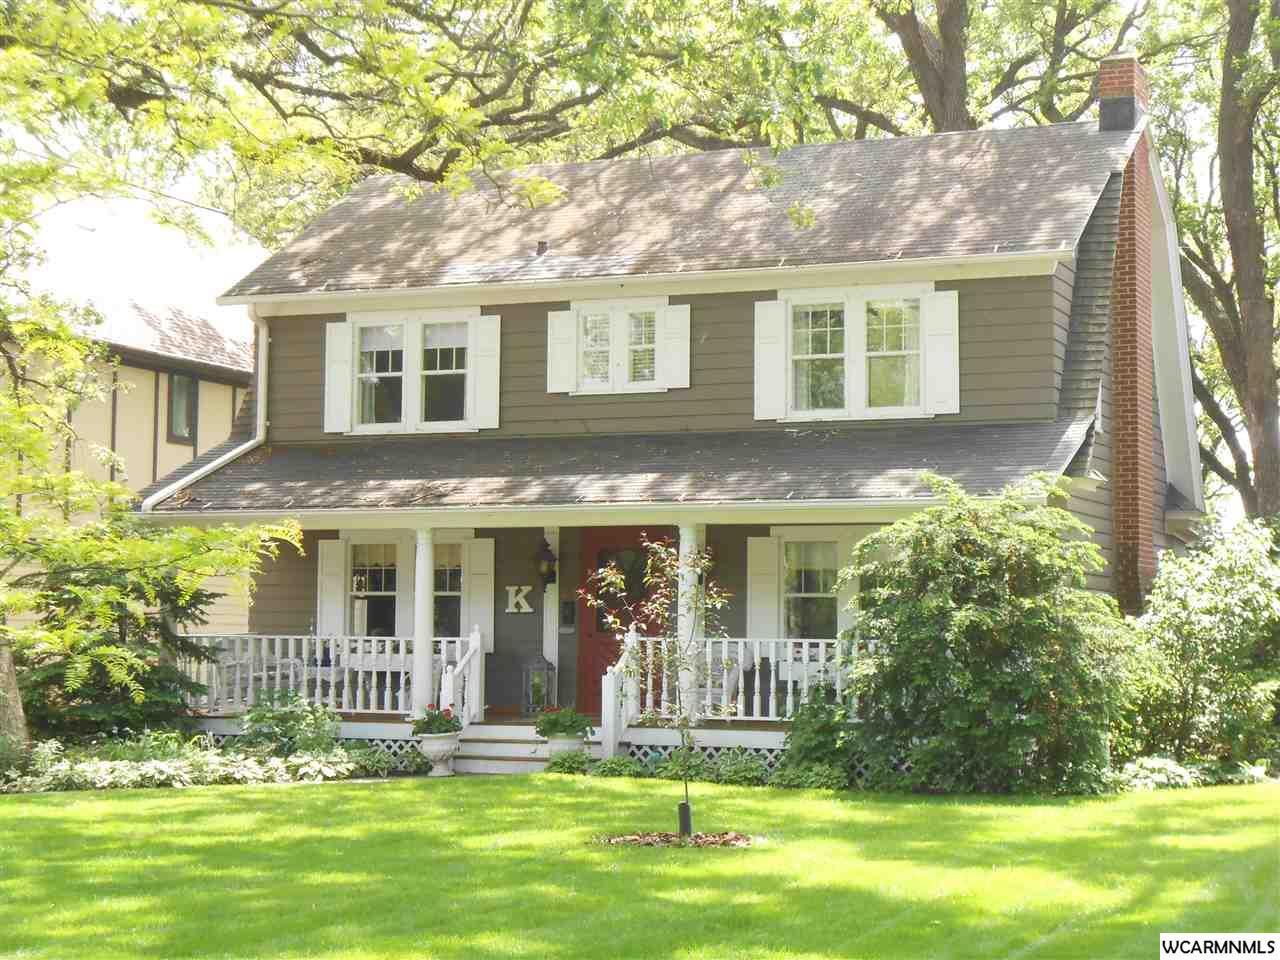 Real Estate for Sale, ListingId: 31868439, Fairmont,MN56031